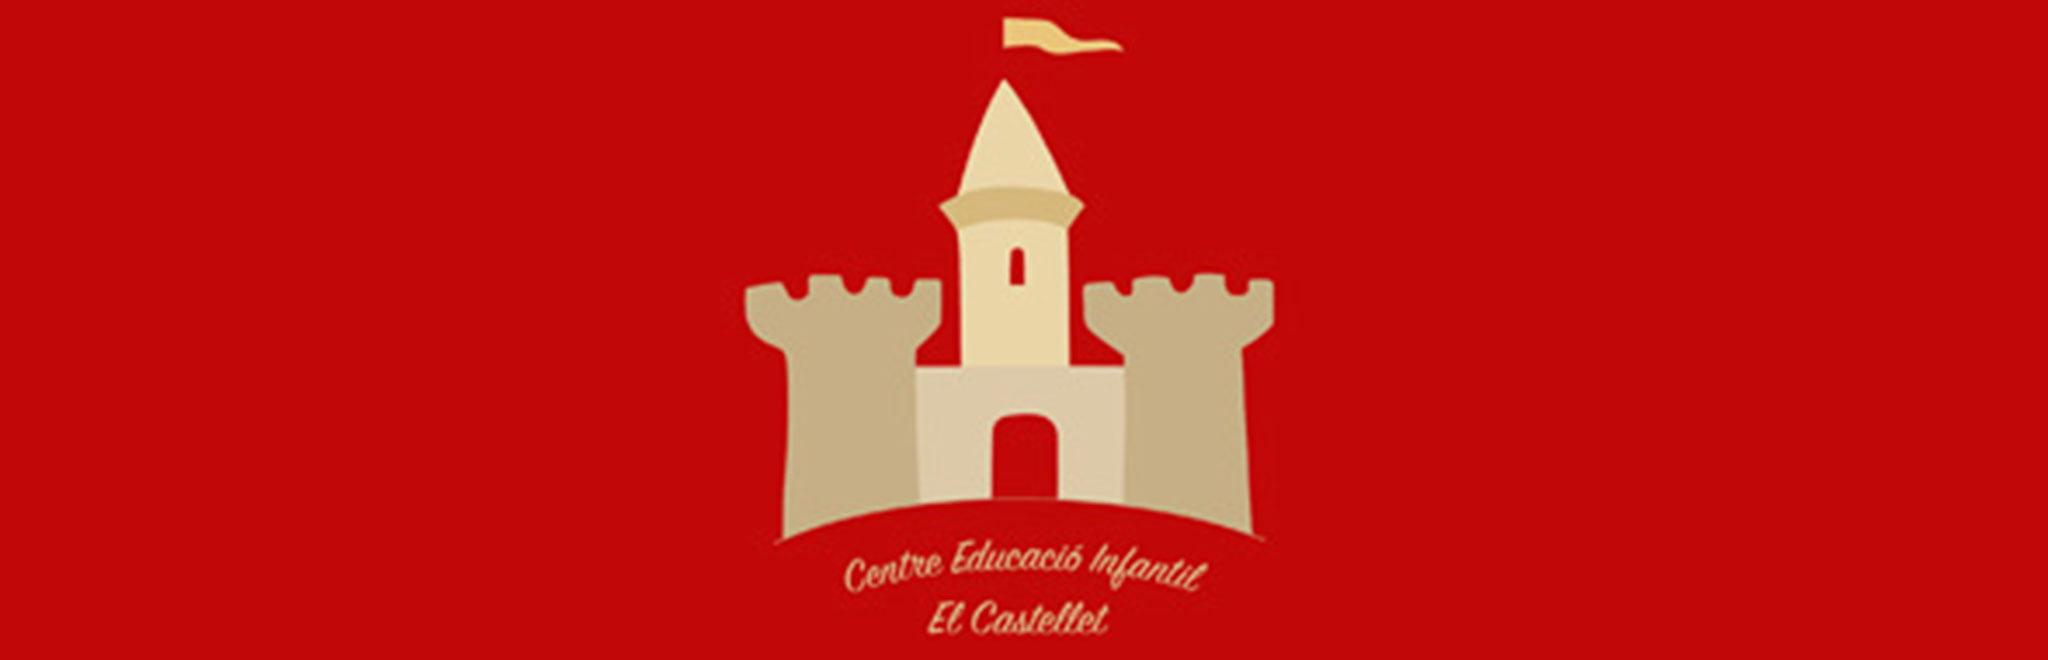 CEI El Castellet's logo